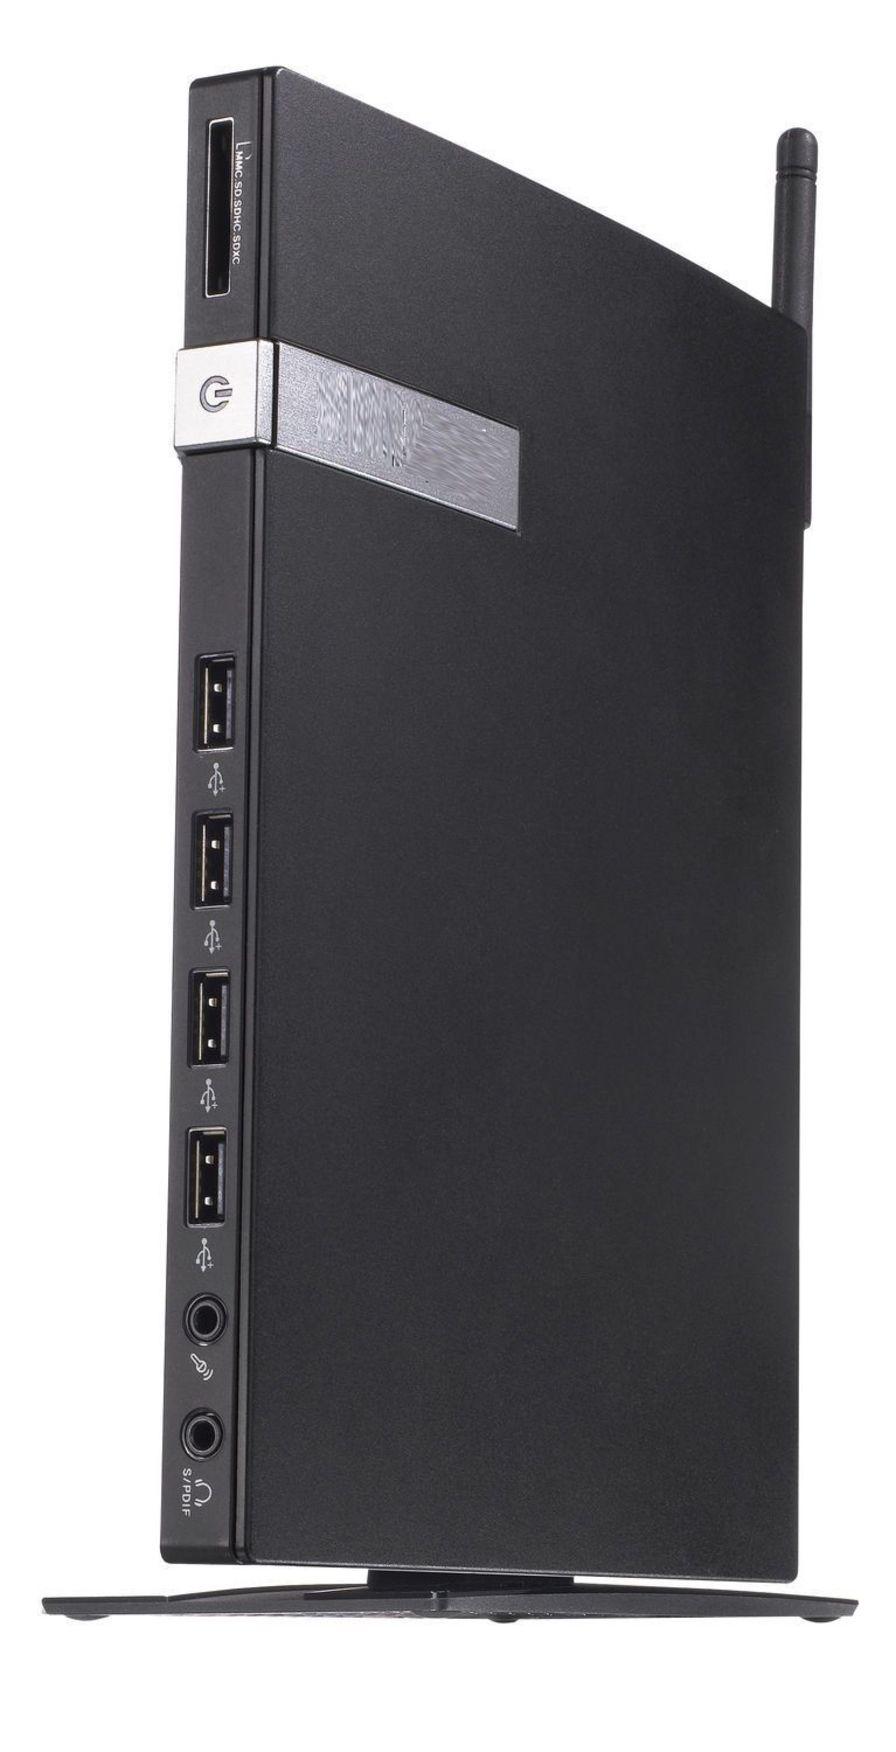 Fanless medical box PC MedPC-1000 Onyx Healthcare Inc